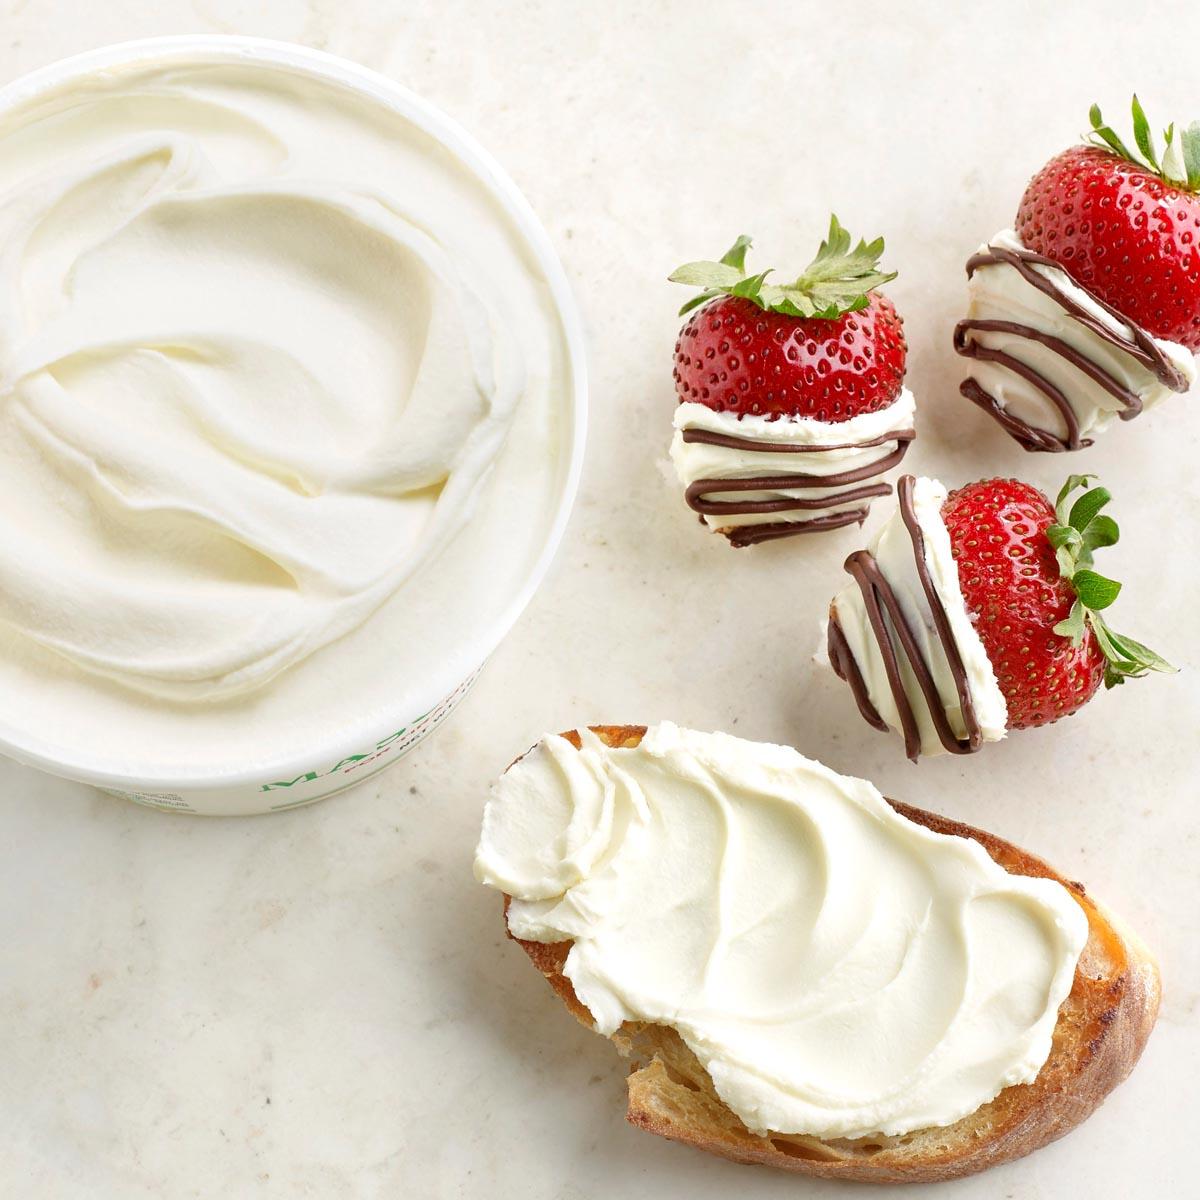 Mascarpone and Strawberries